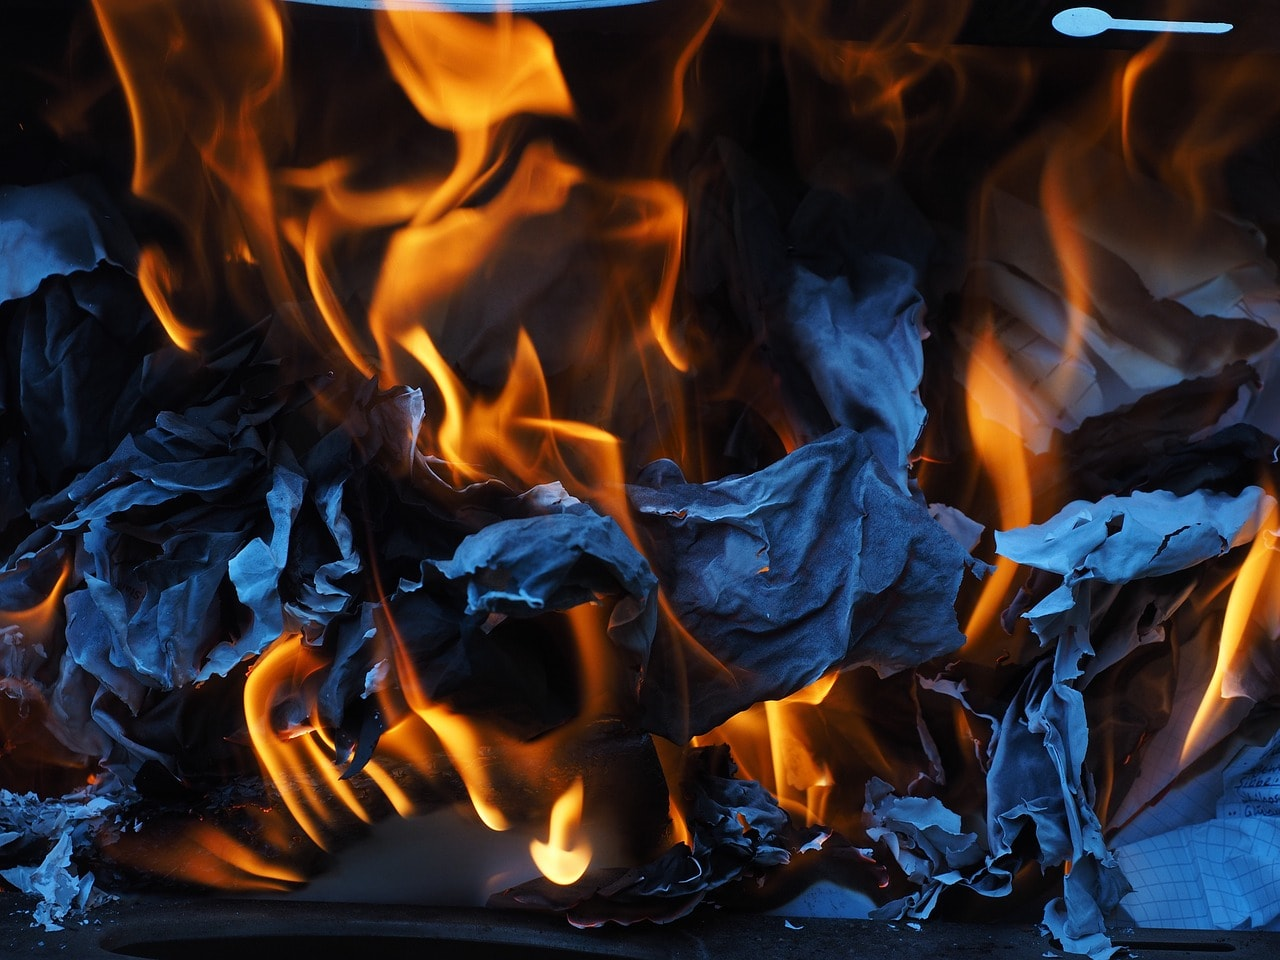 Feuer Flammen Grillen